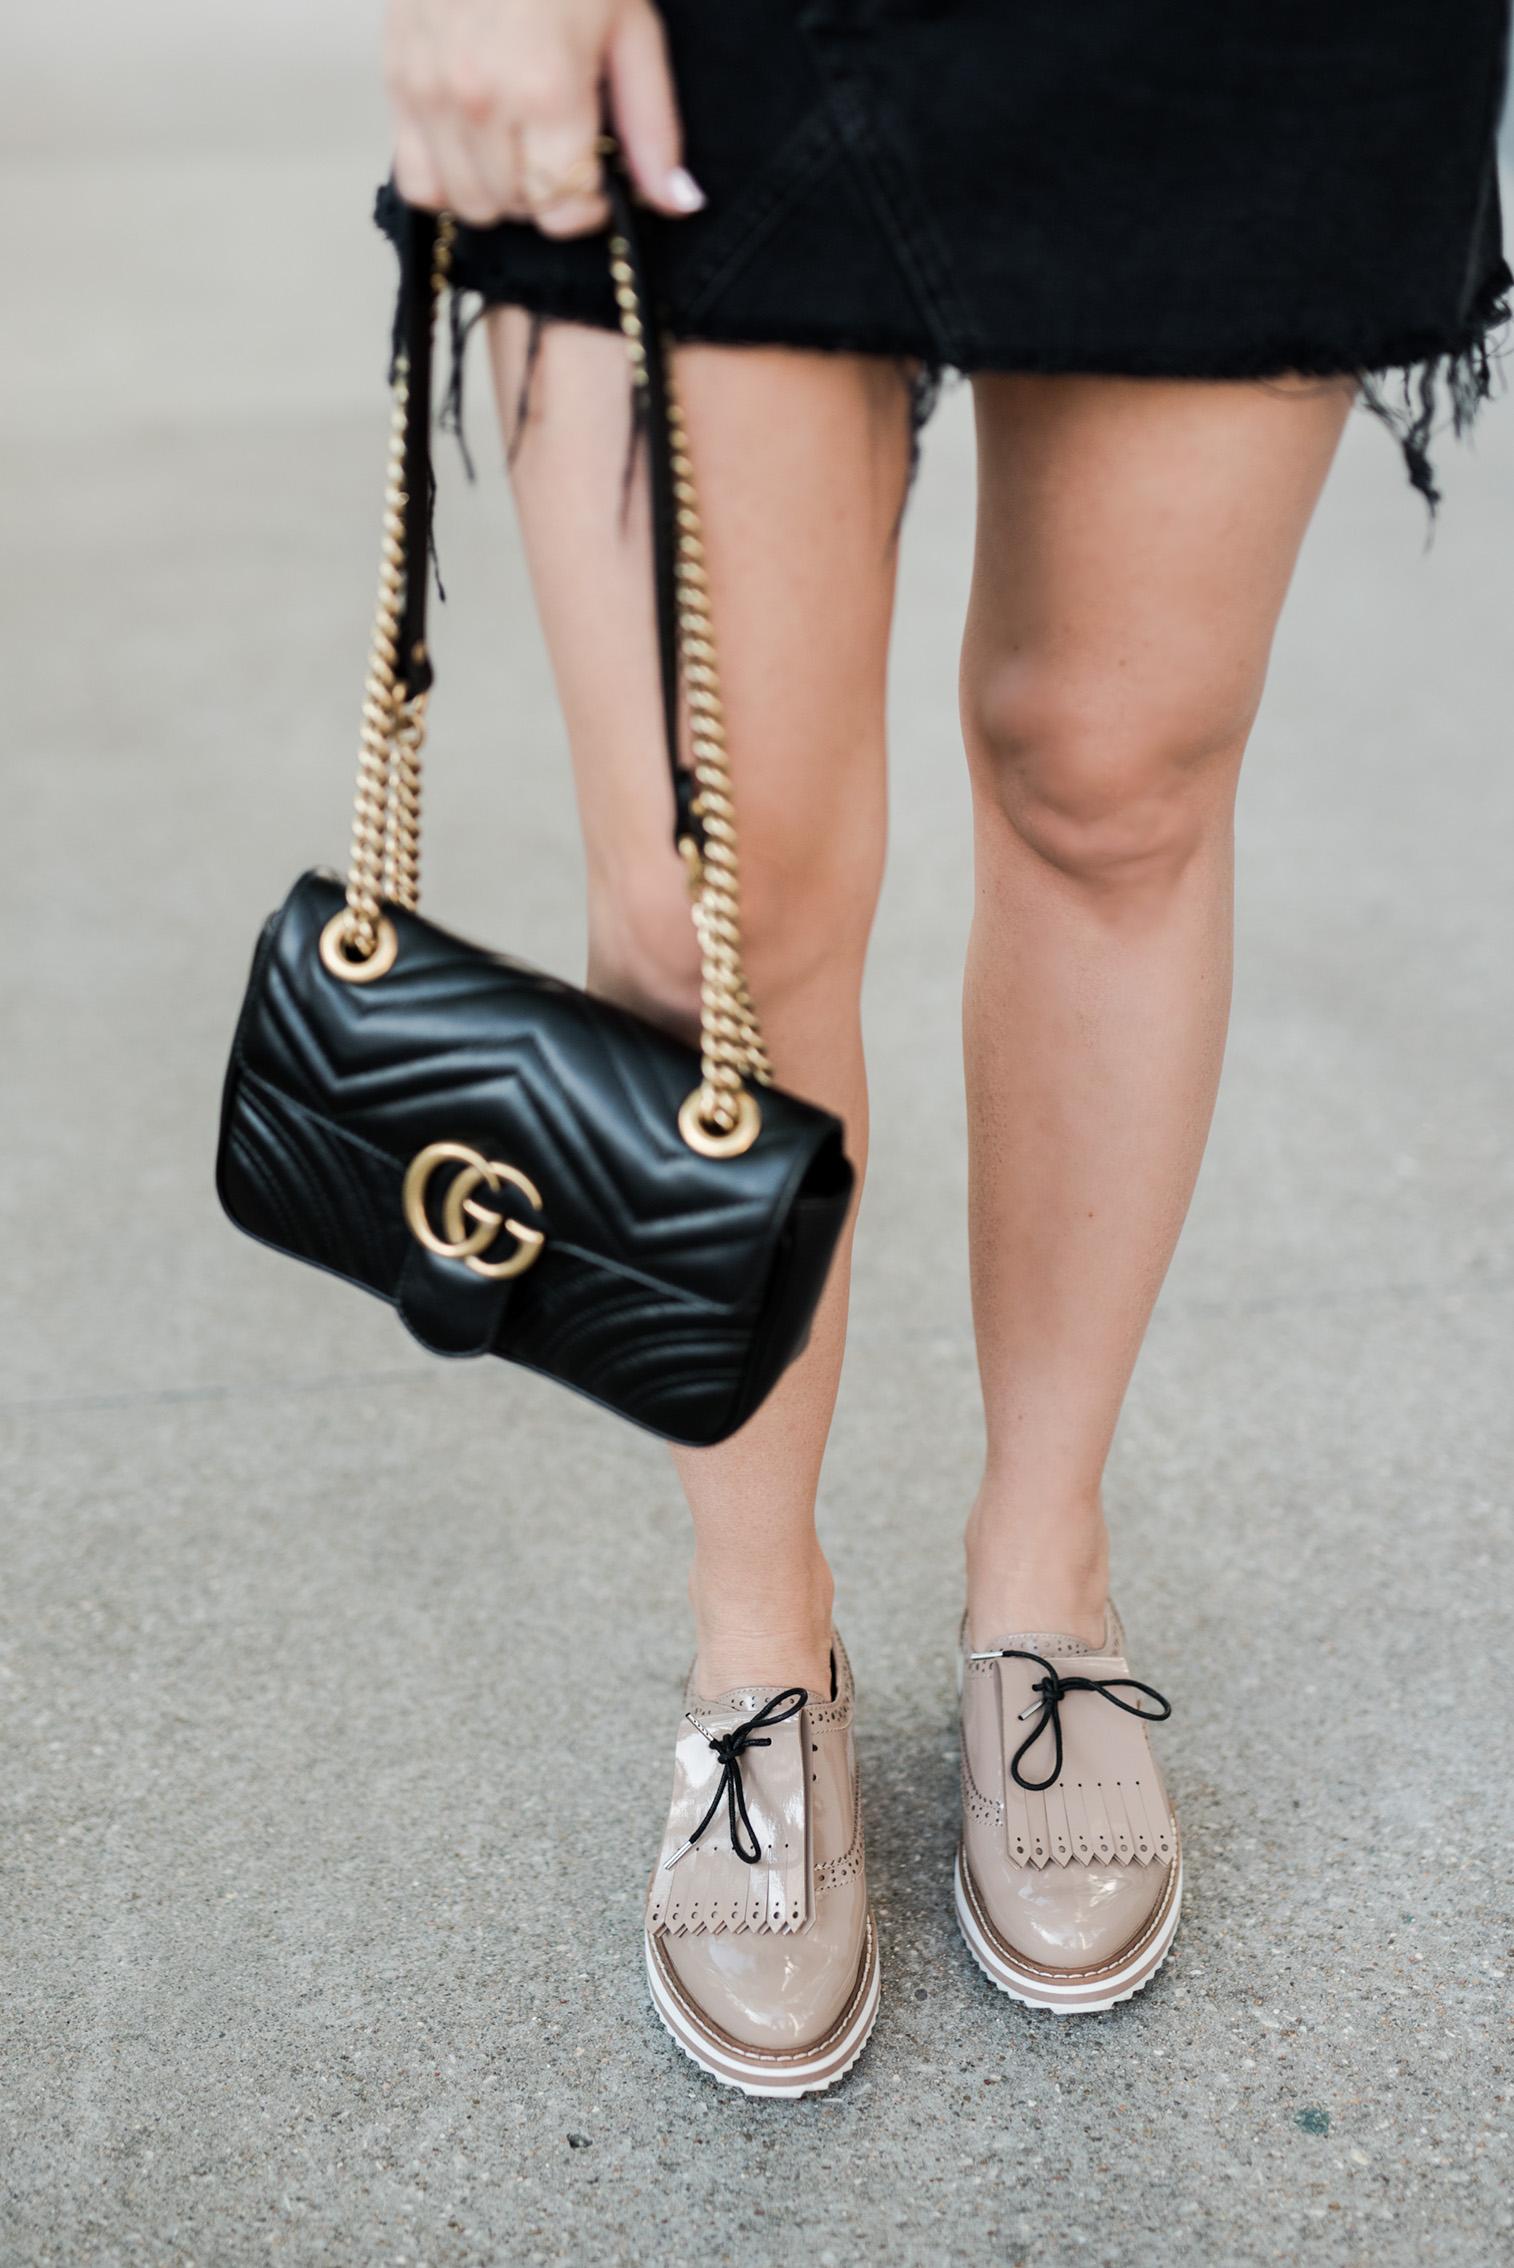 Tiffany Jais Houston fashion and lifestyle blogger | T-shirt obsessed, platform oxfords, gucci Marmont bag, black denim skirt,